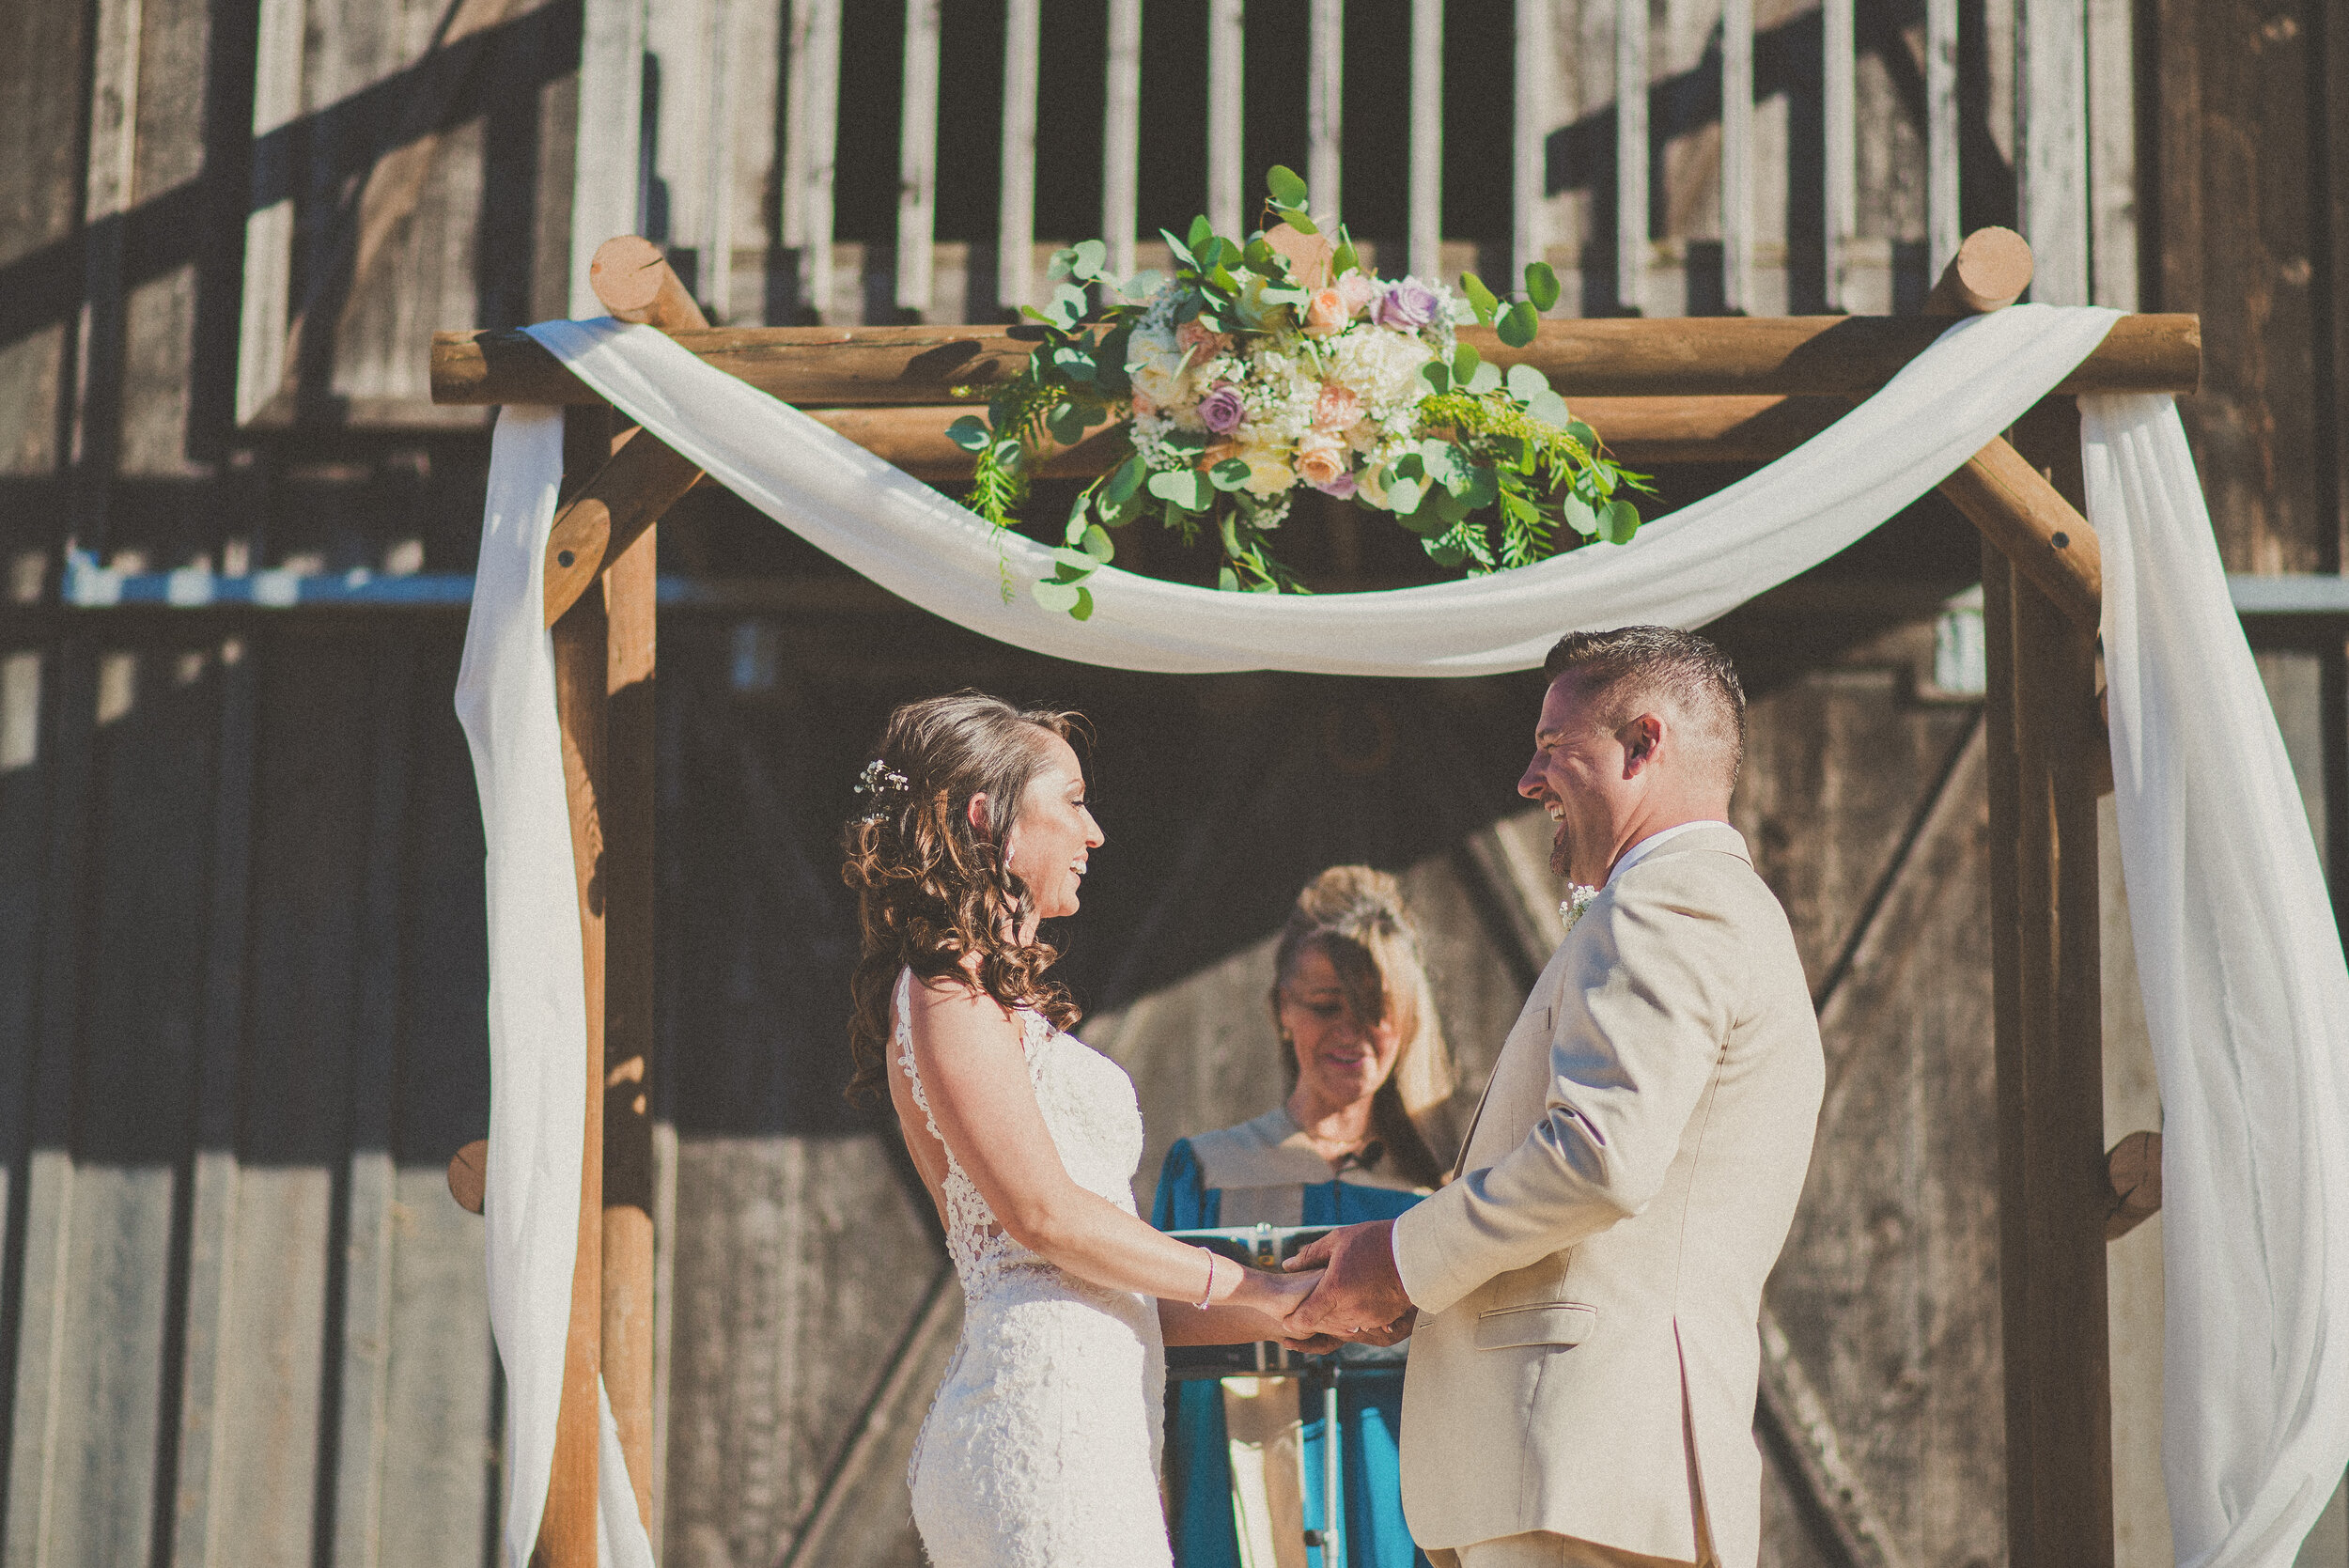 Roberts Wedding - Ceremony-83.jpg